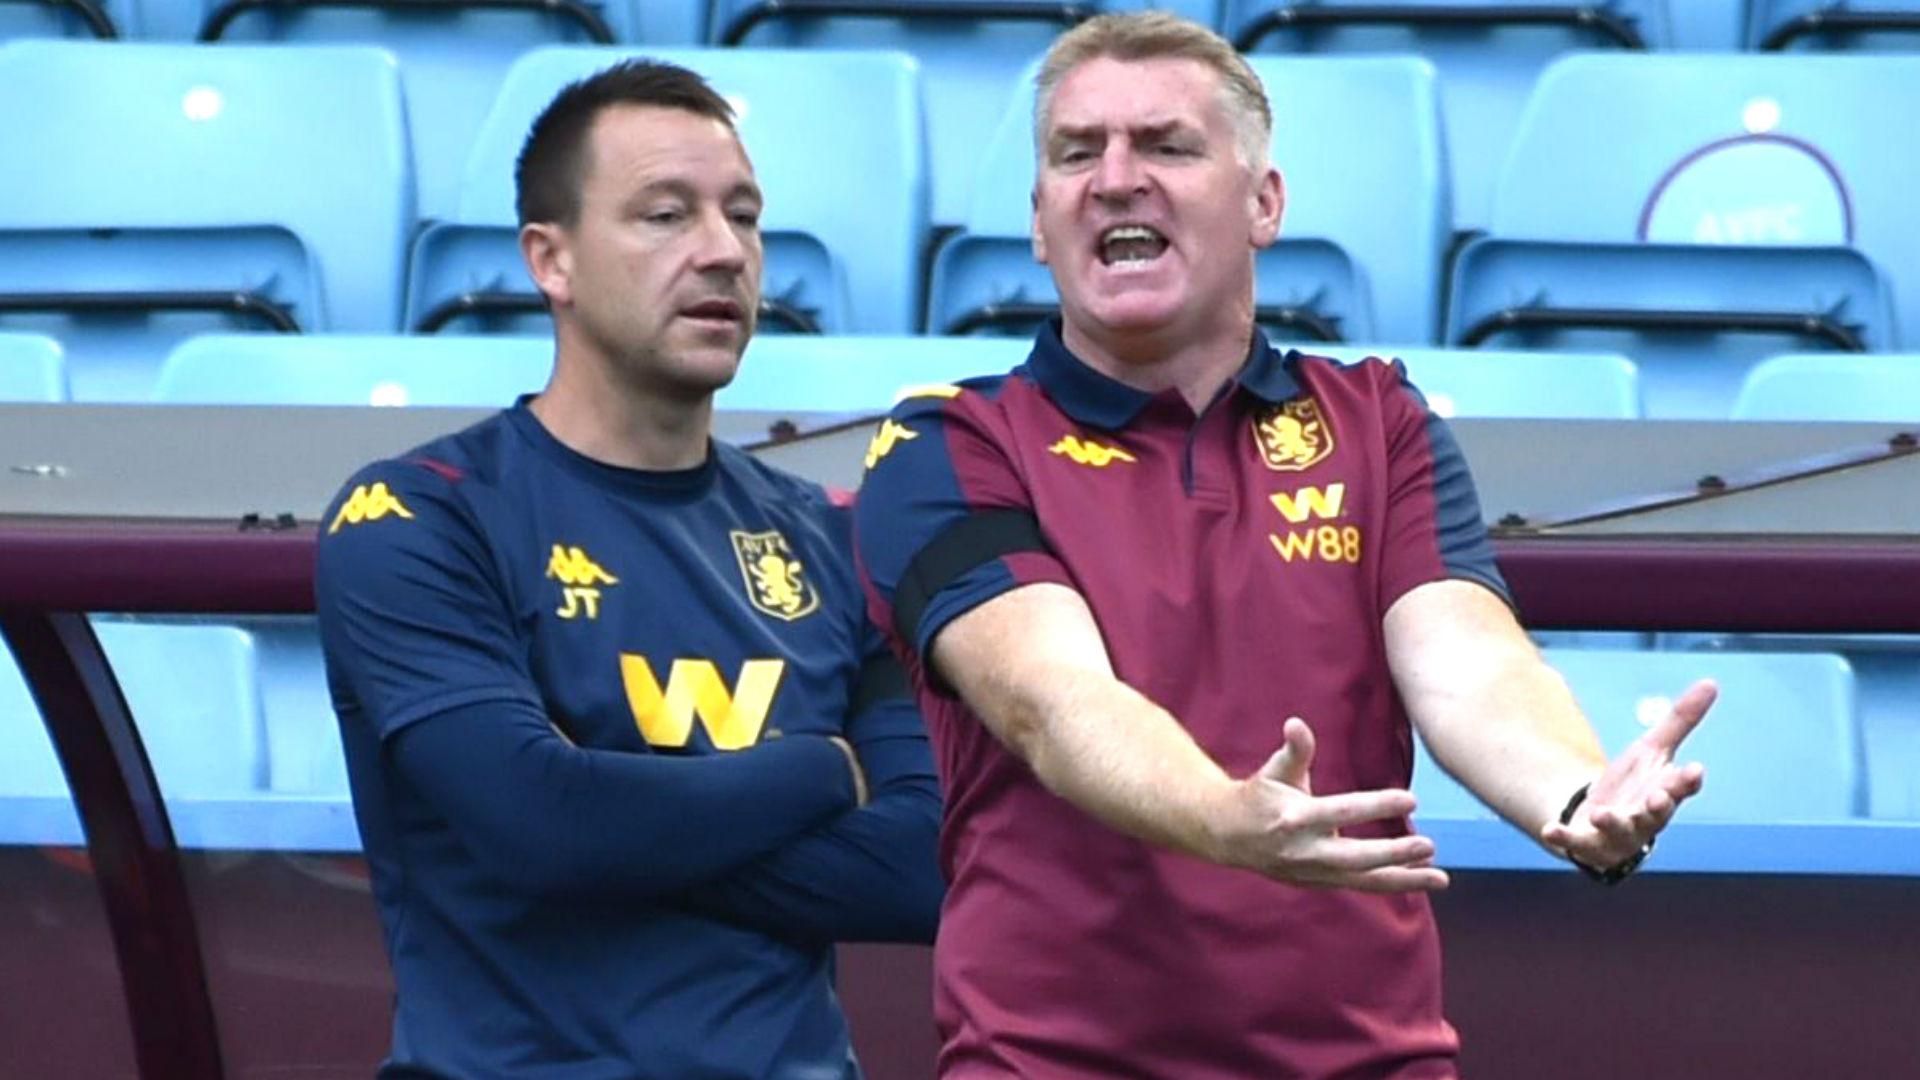 Terry 'fully focused' on Aston Villa despite Bristol City talk - Smith